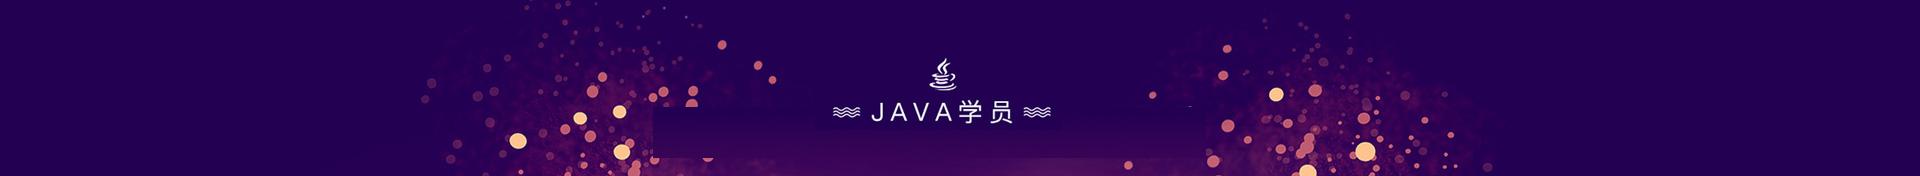 Java学员,速度双领先